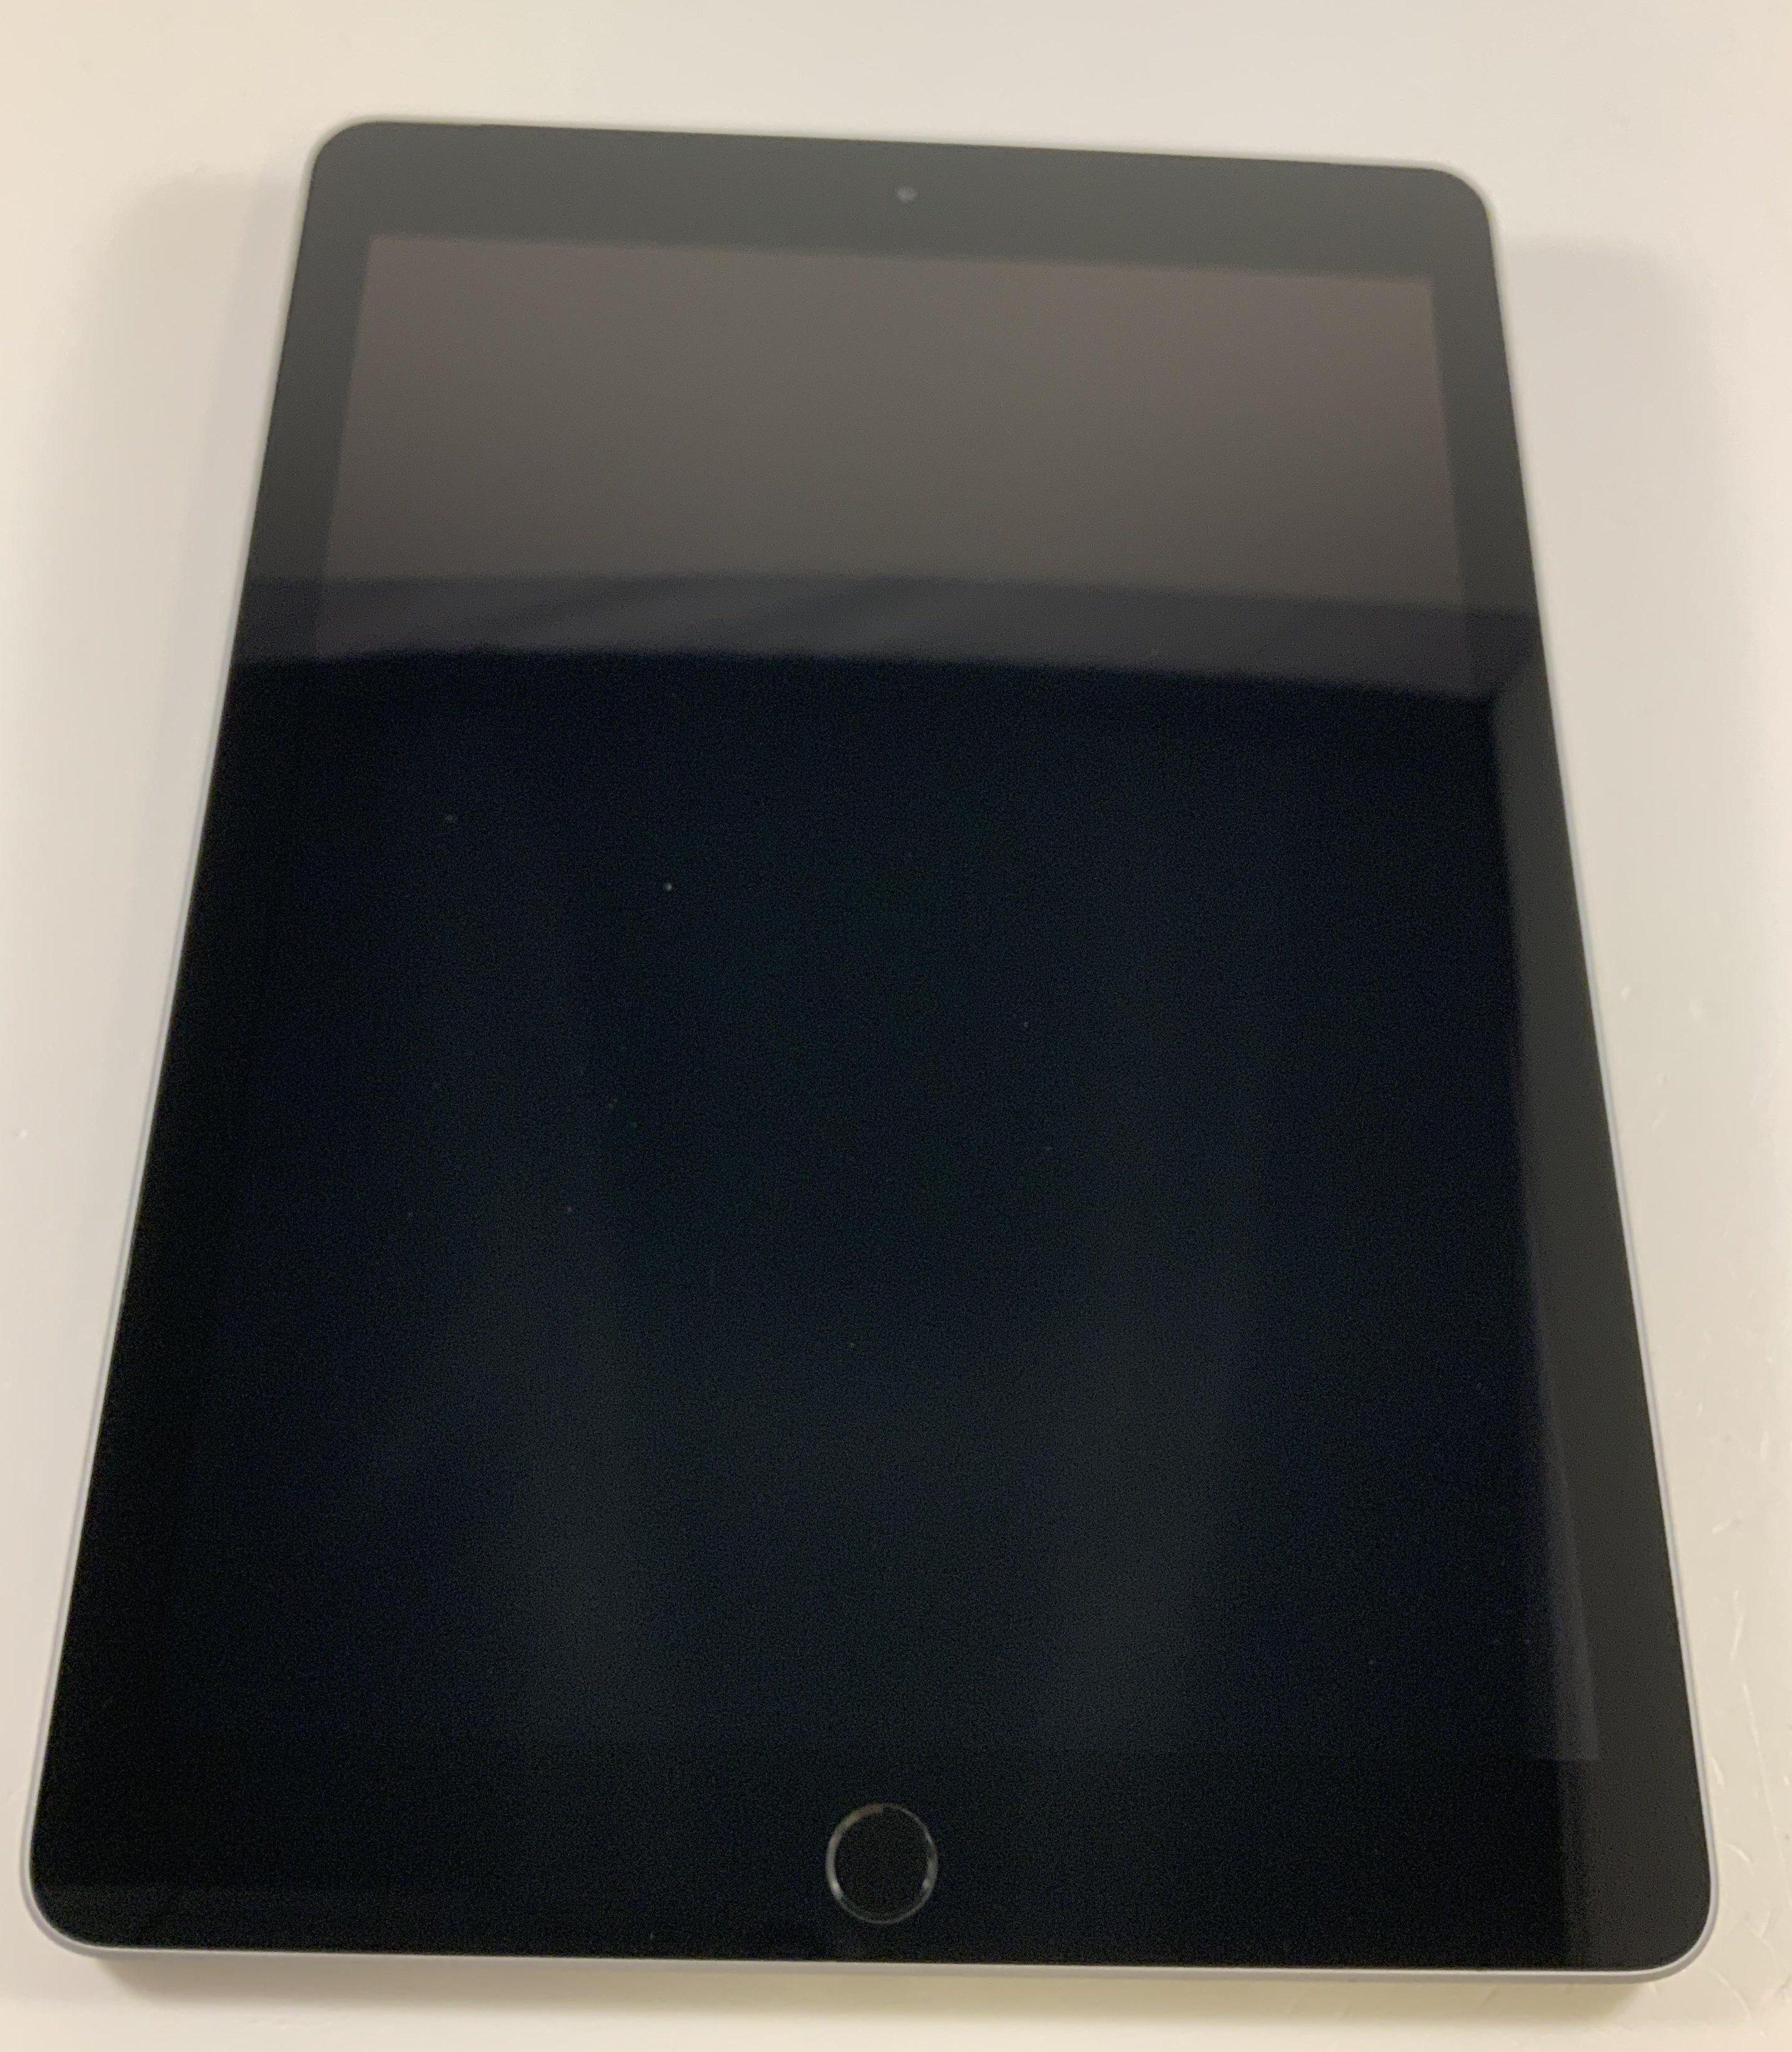 iPad 6 Wi-Fi + Cellular 32GB, 32GB, Space Gray, imagen 1